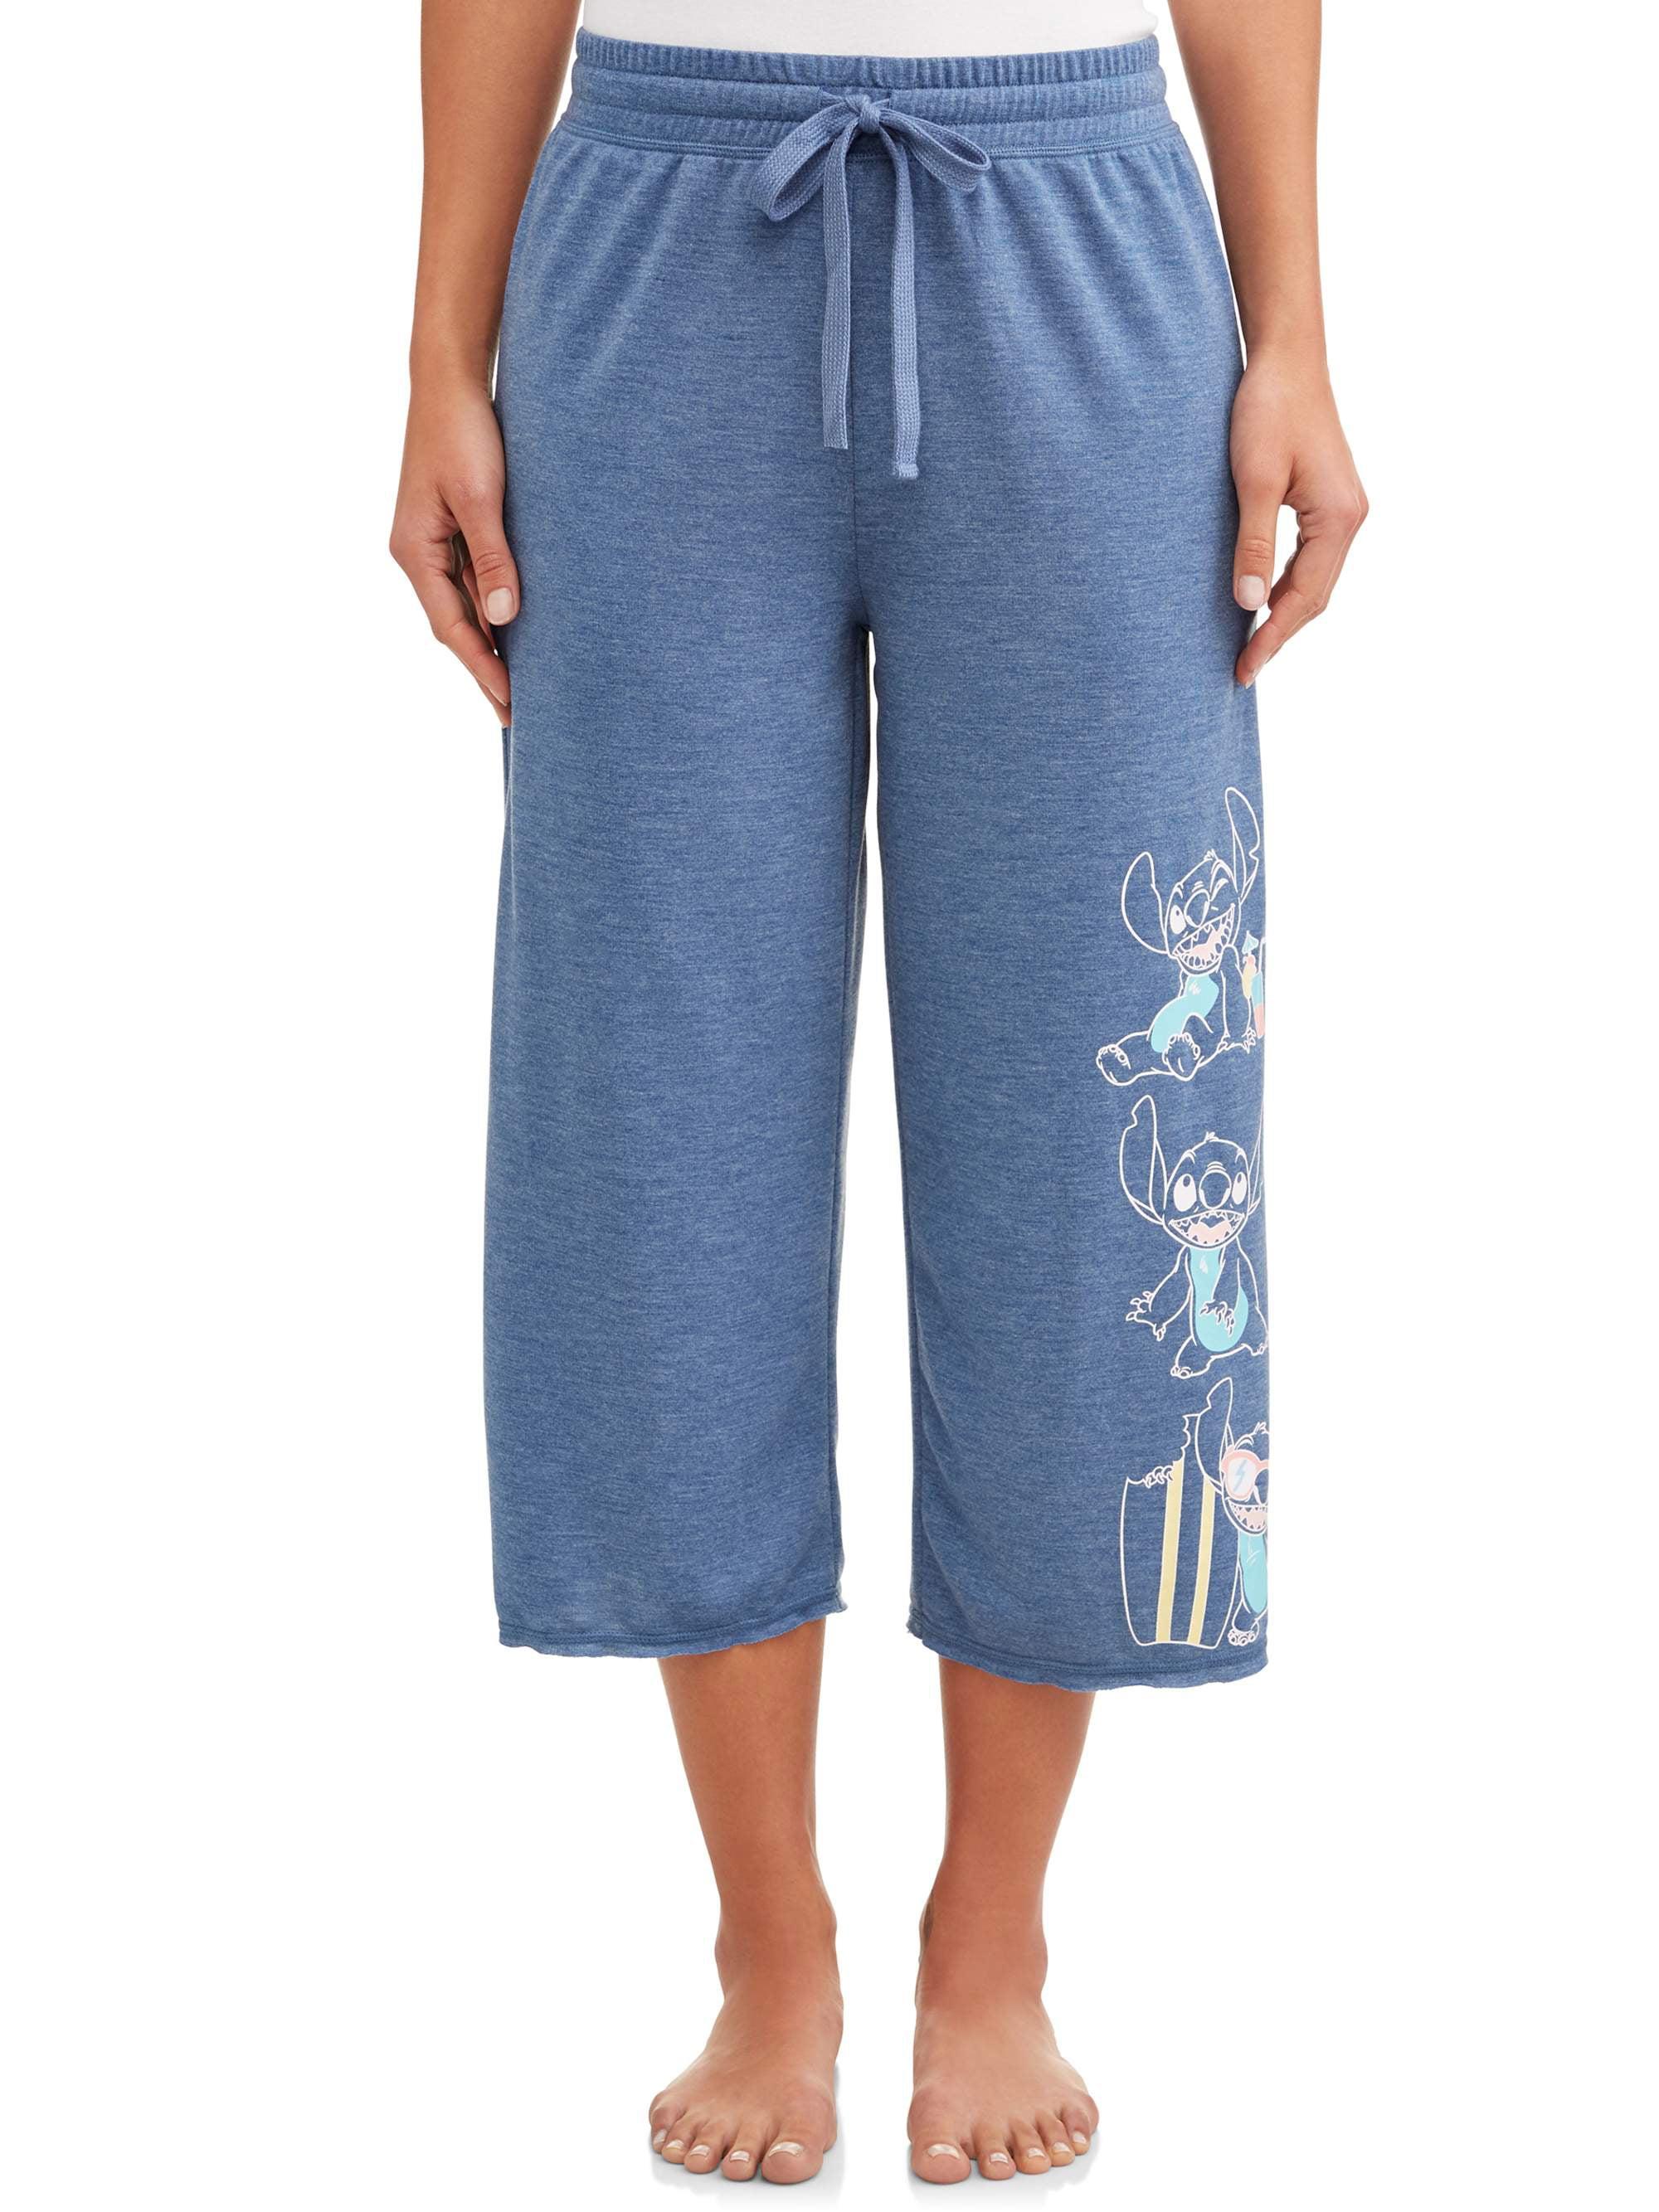 Disney Women's and Women's Plus License Pant Stitch